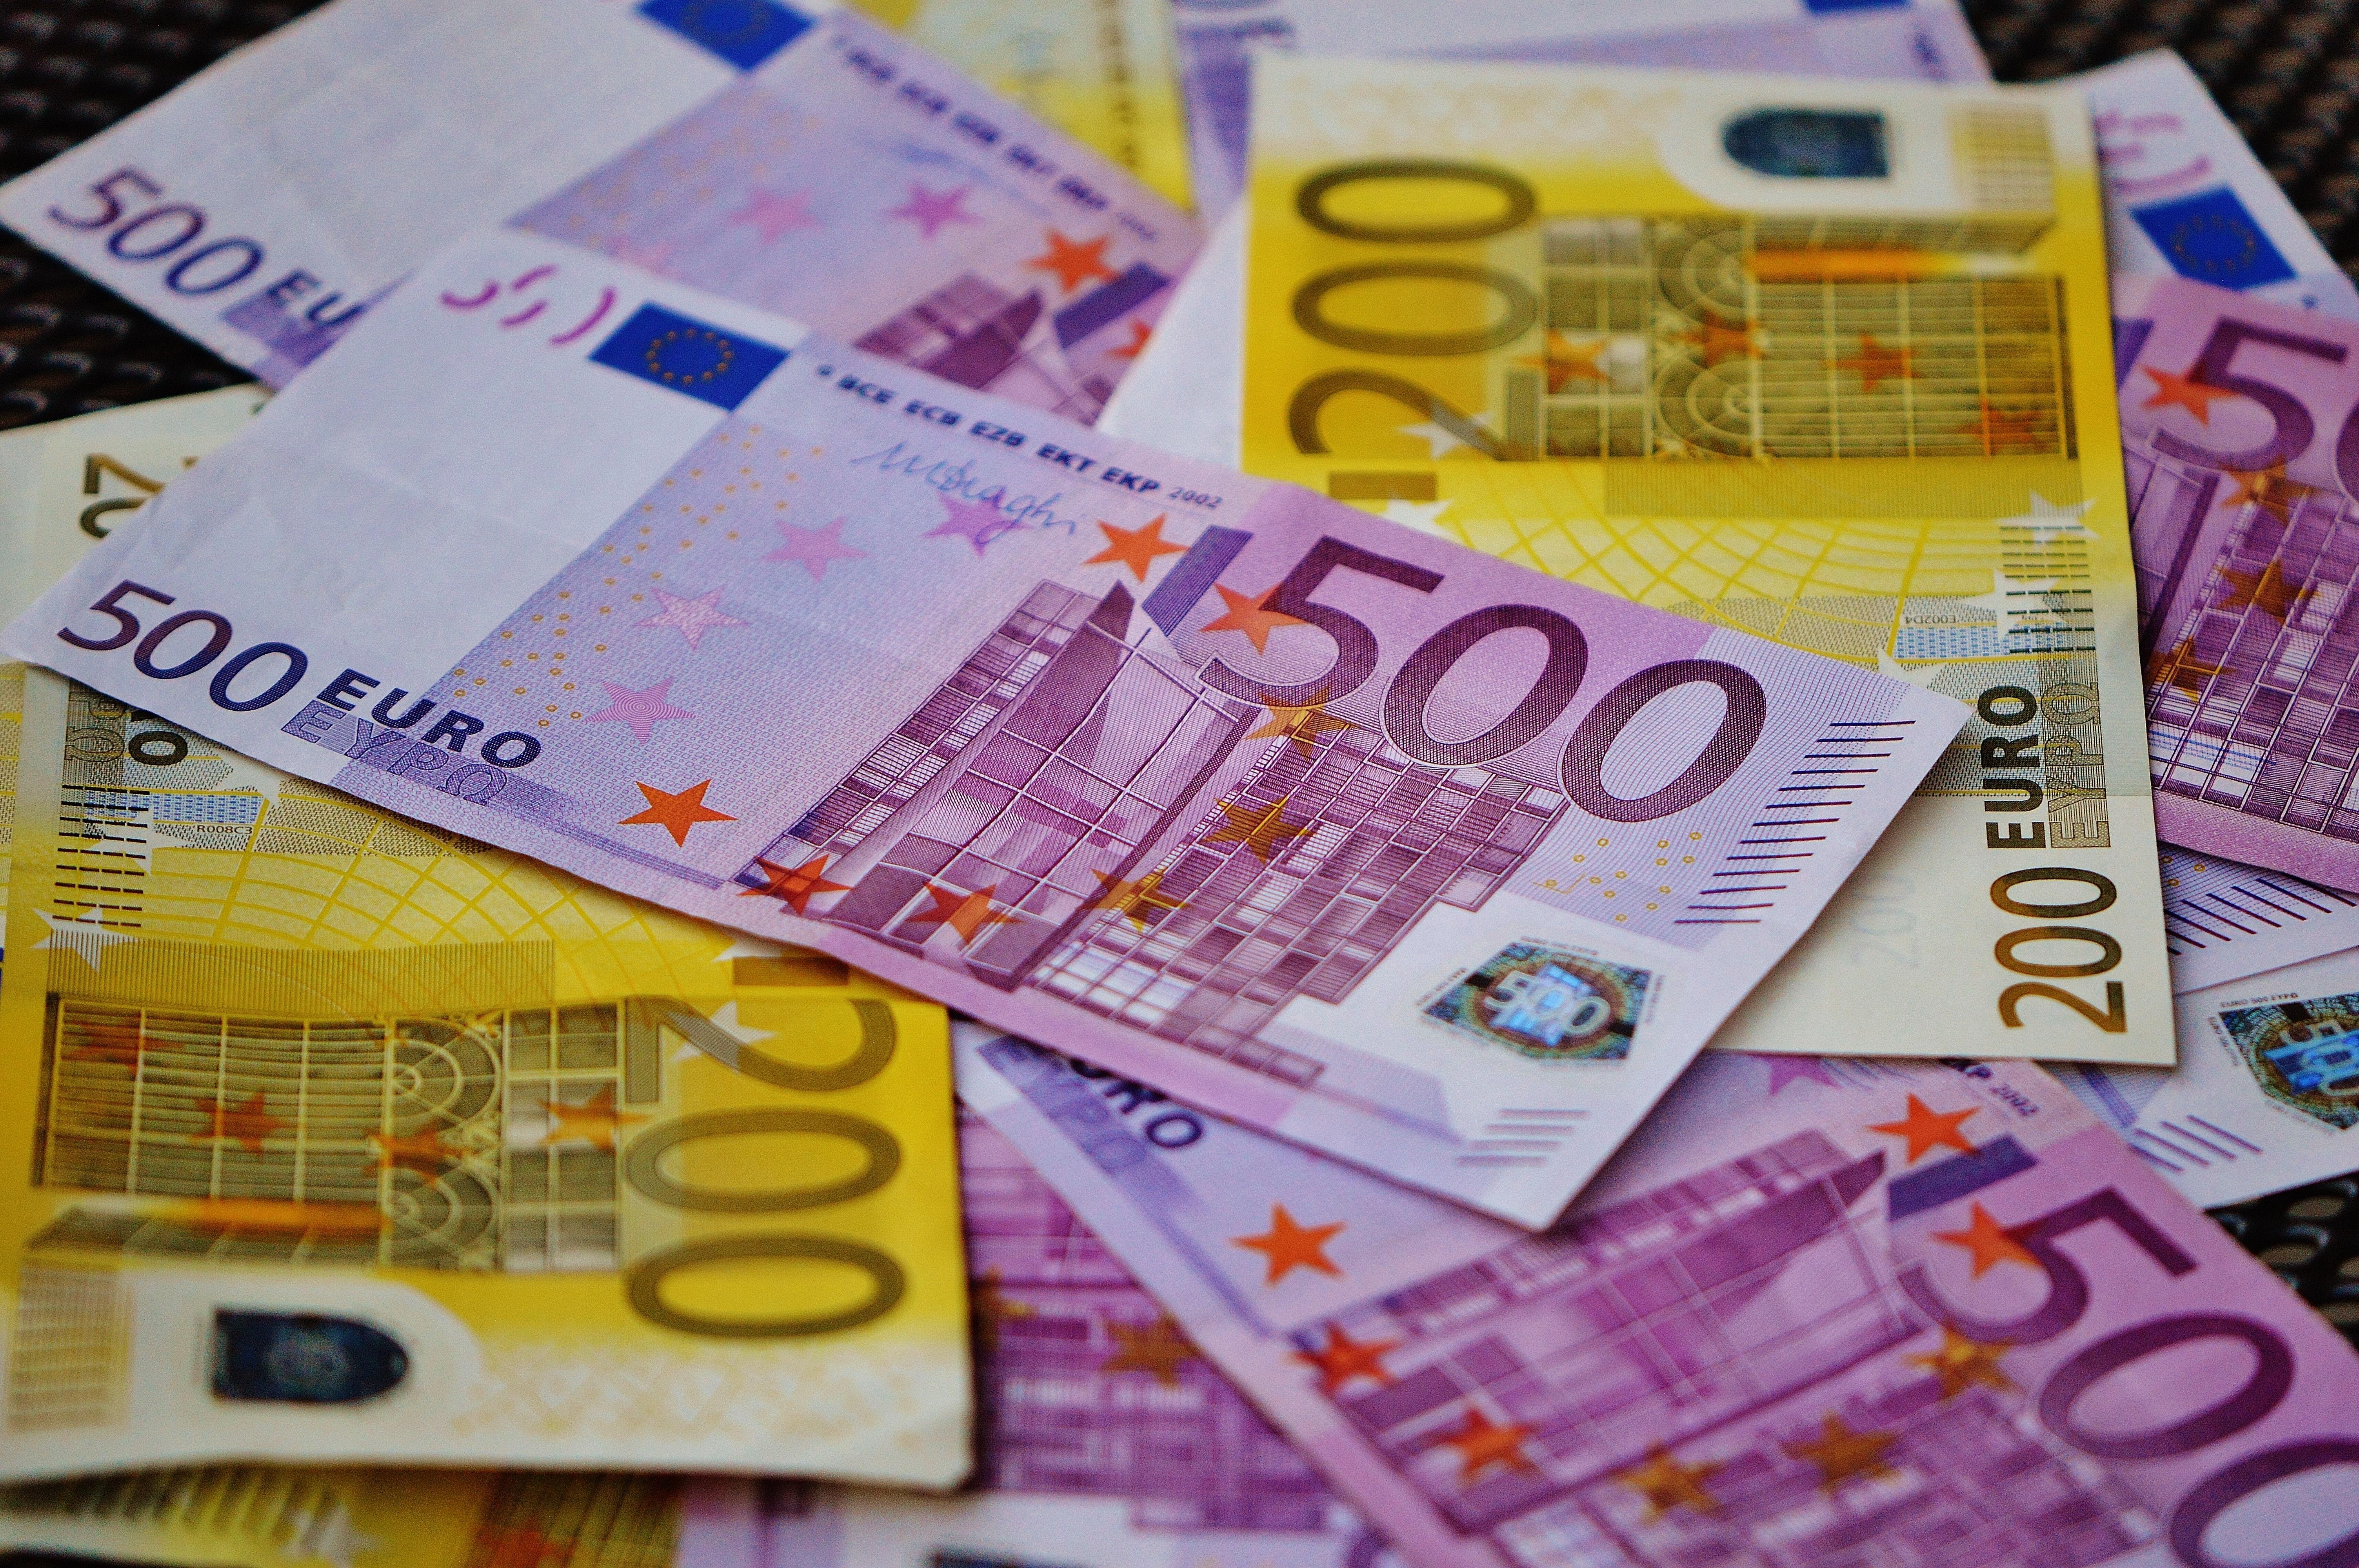 500 Euro Bill, Bank notes, Bills, Cash, Currency, HQ Photo